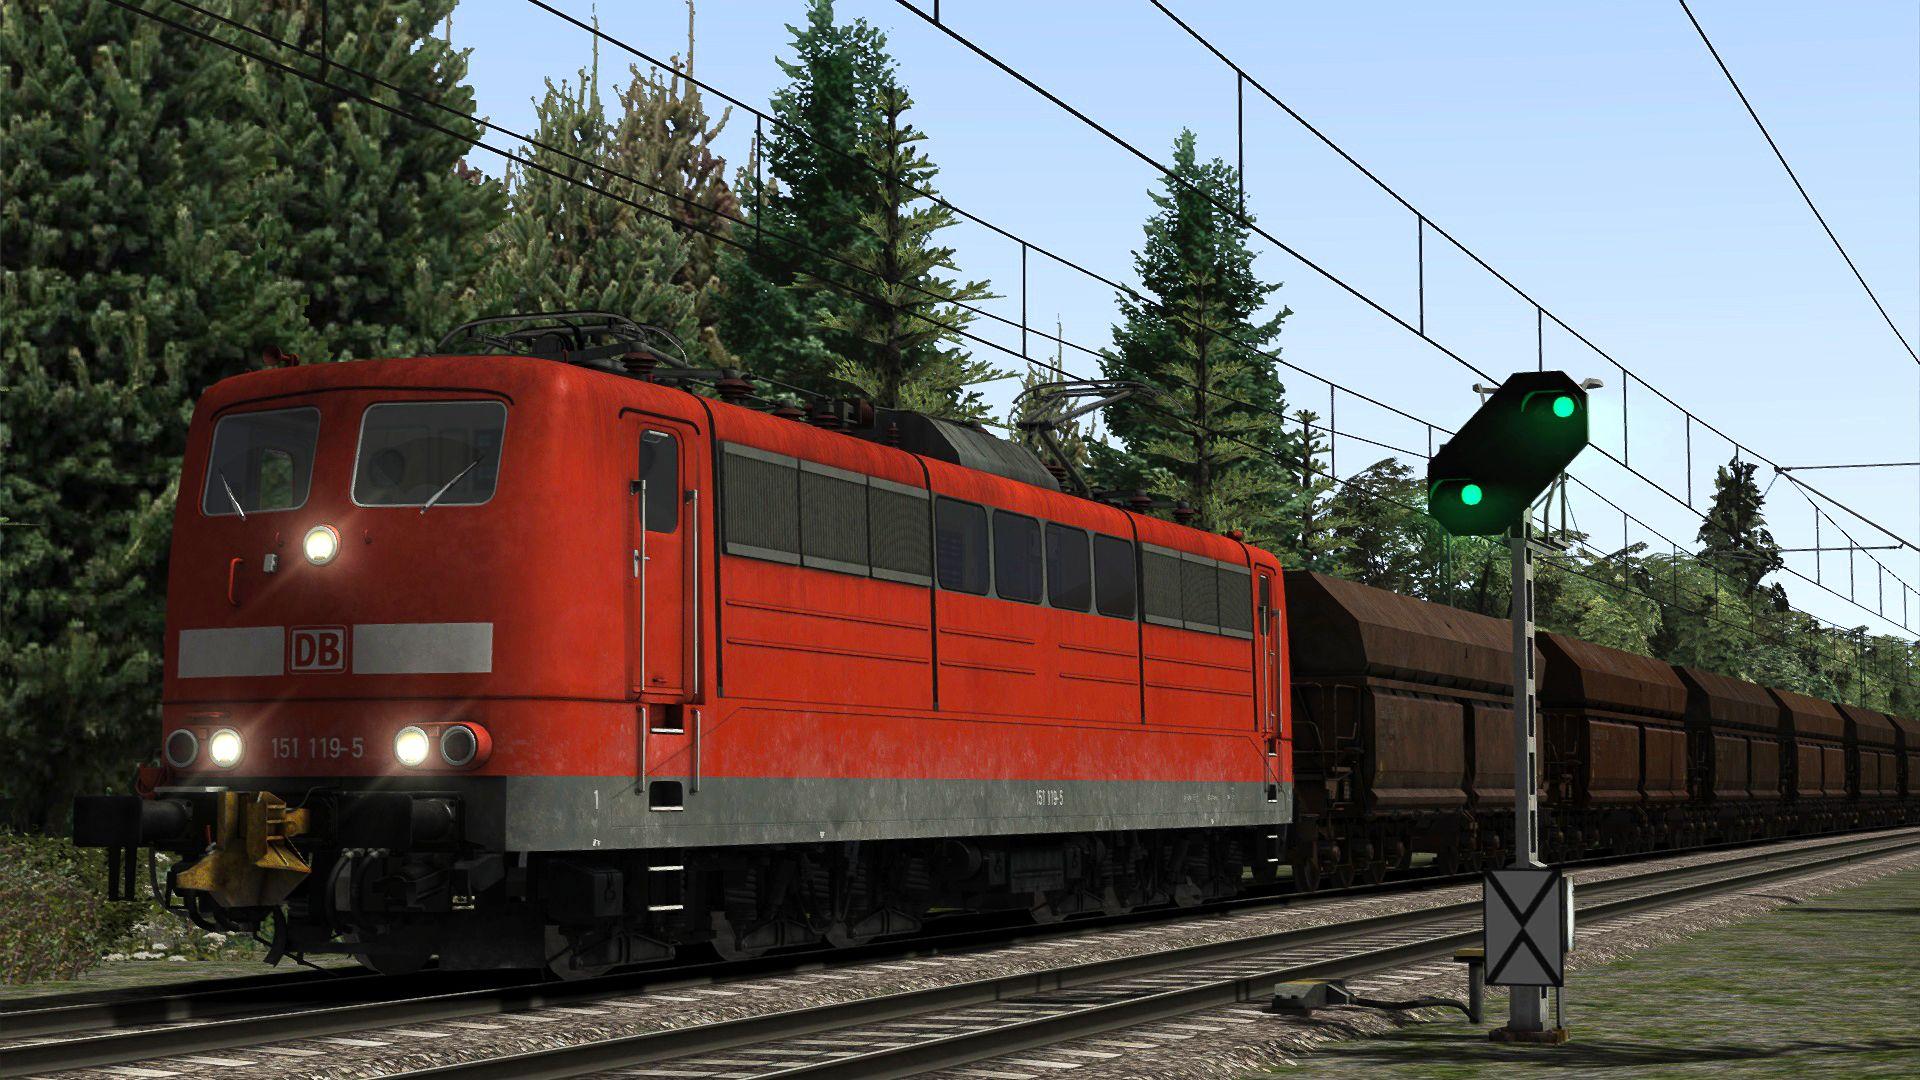 DB1511